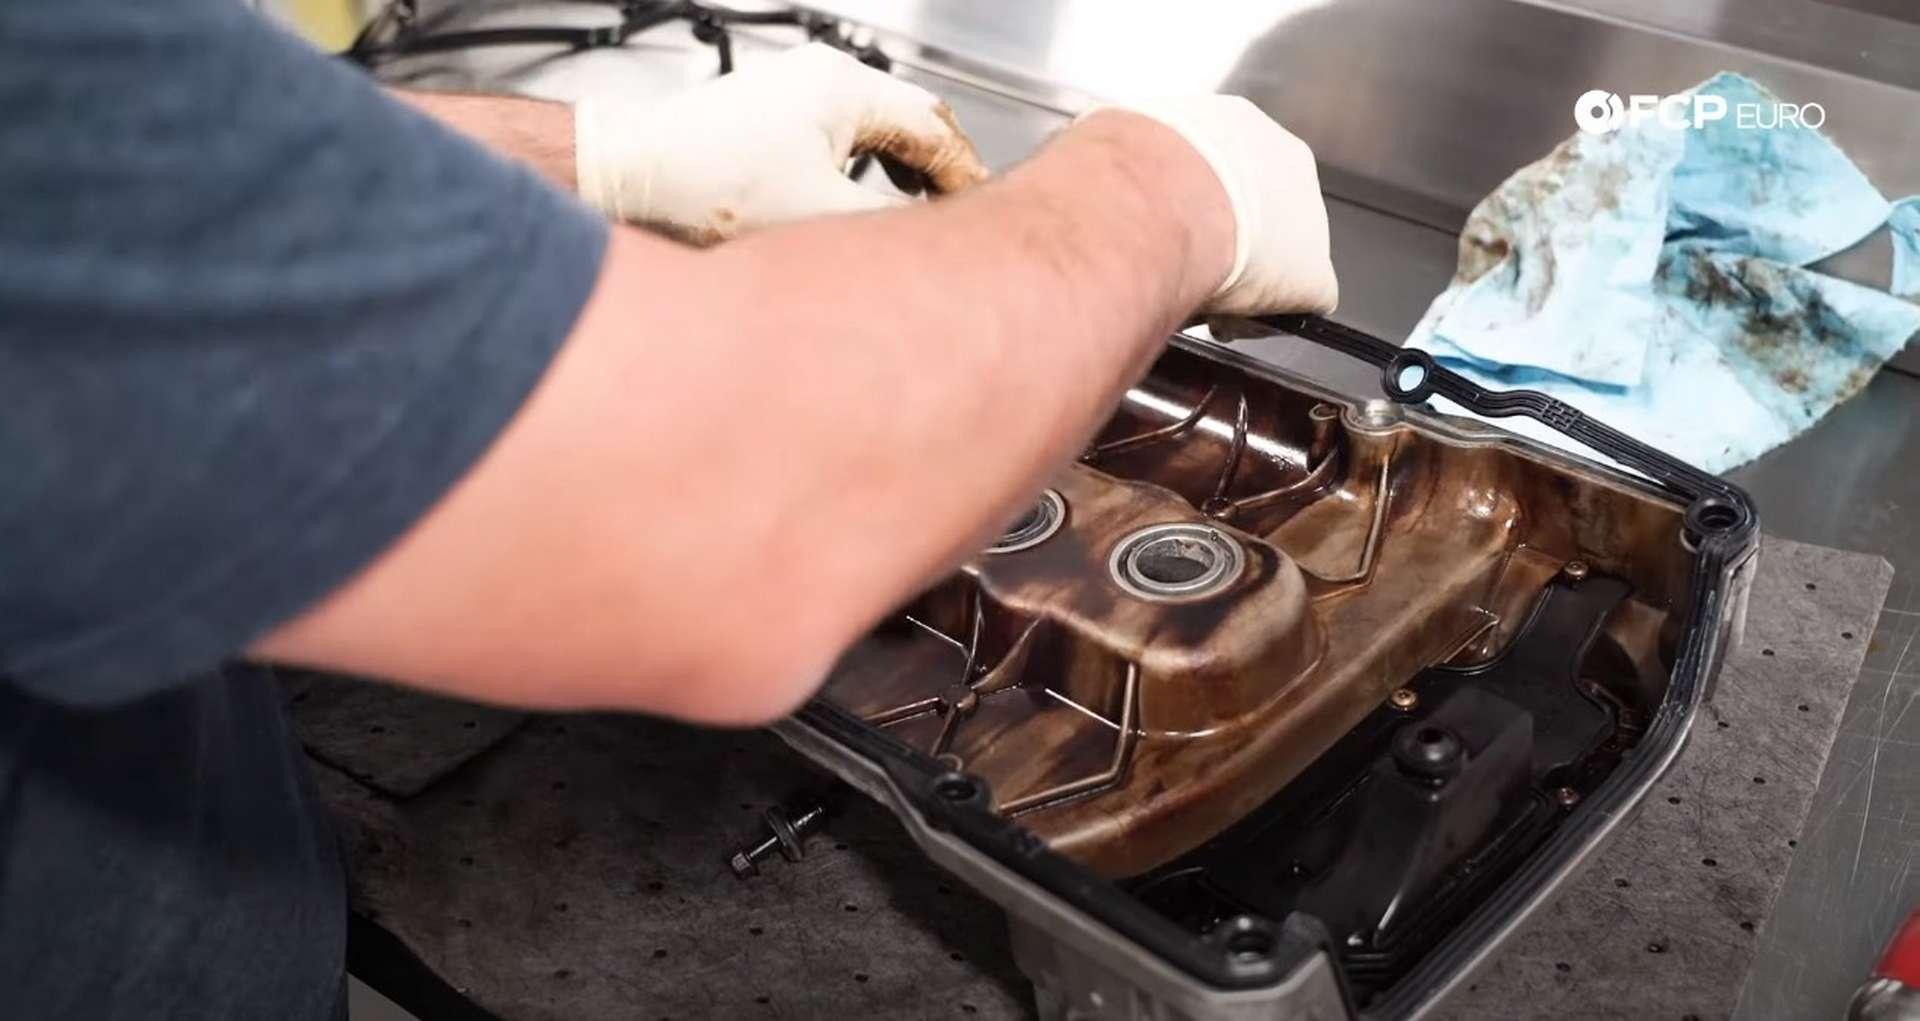 46-DIY-VW-VR6-Valve-Cover-Gasket-Replacing-Gasket